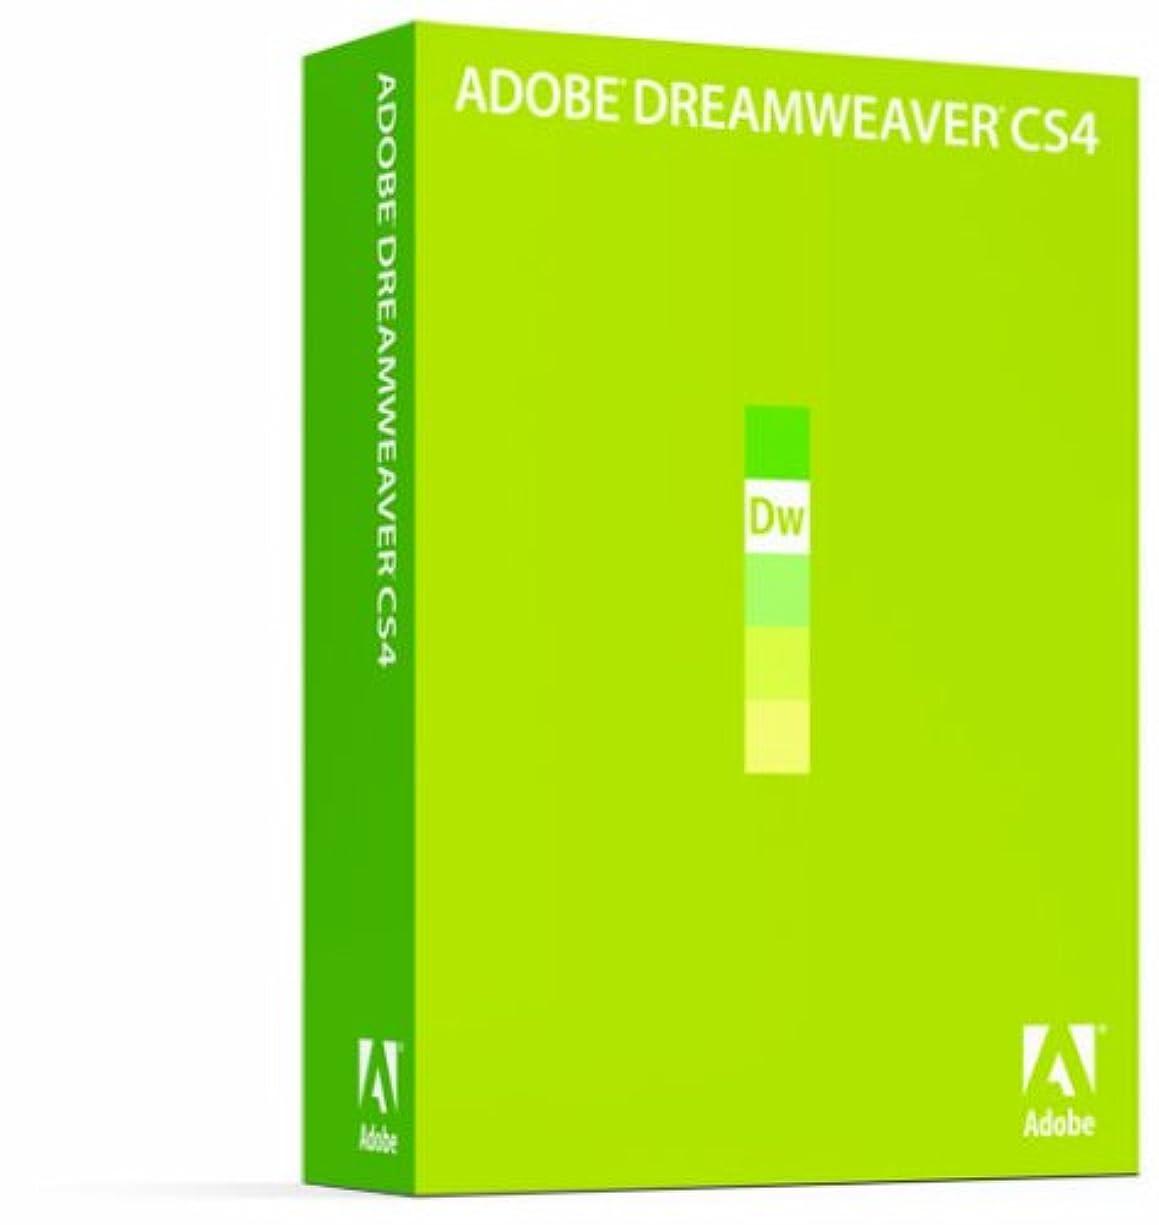 洗剤モニカ予感Adobe Dreamweaver CS4 (V10.0) 日本語版 Windows版 (旧製品)